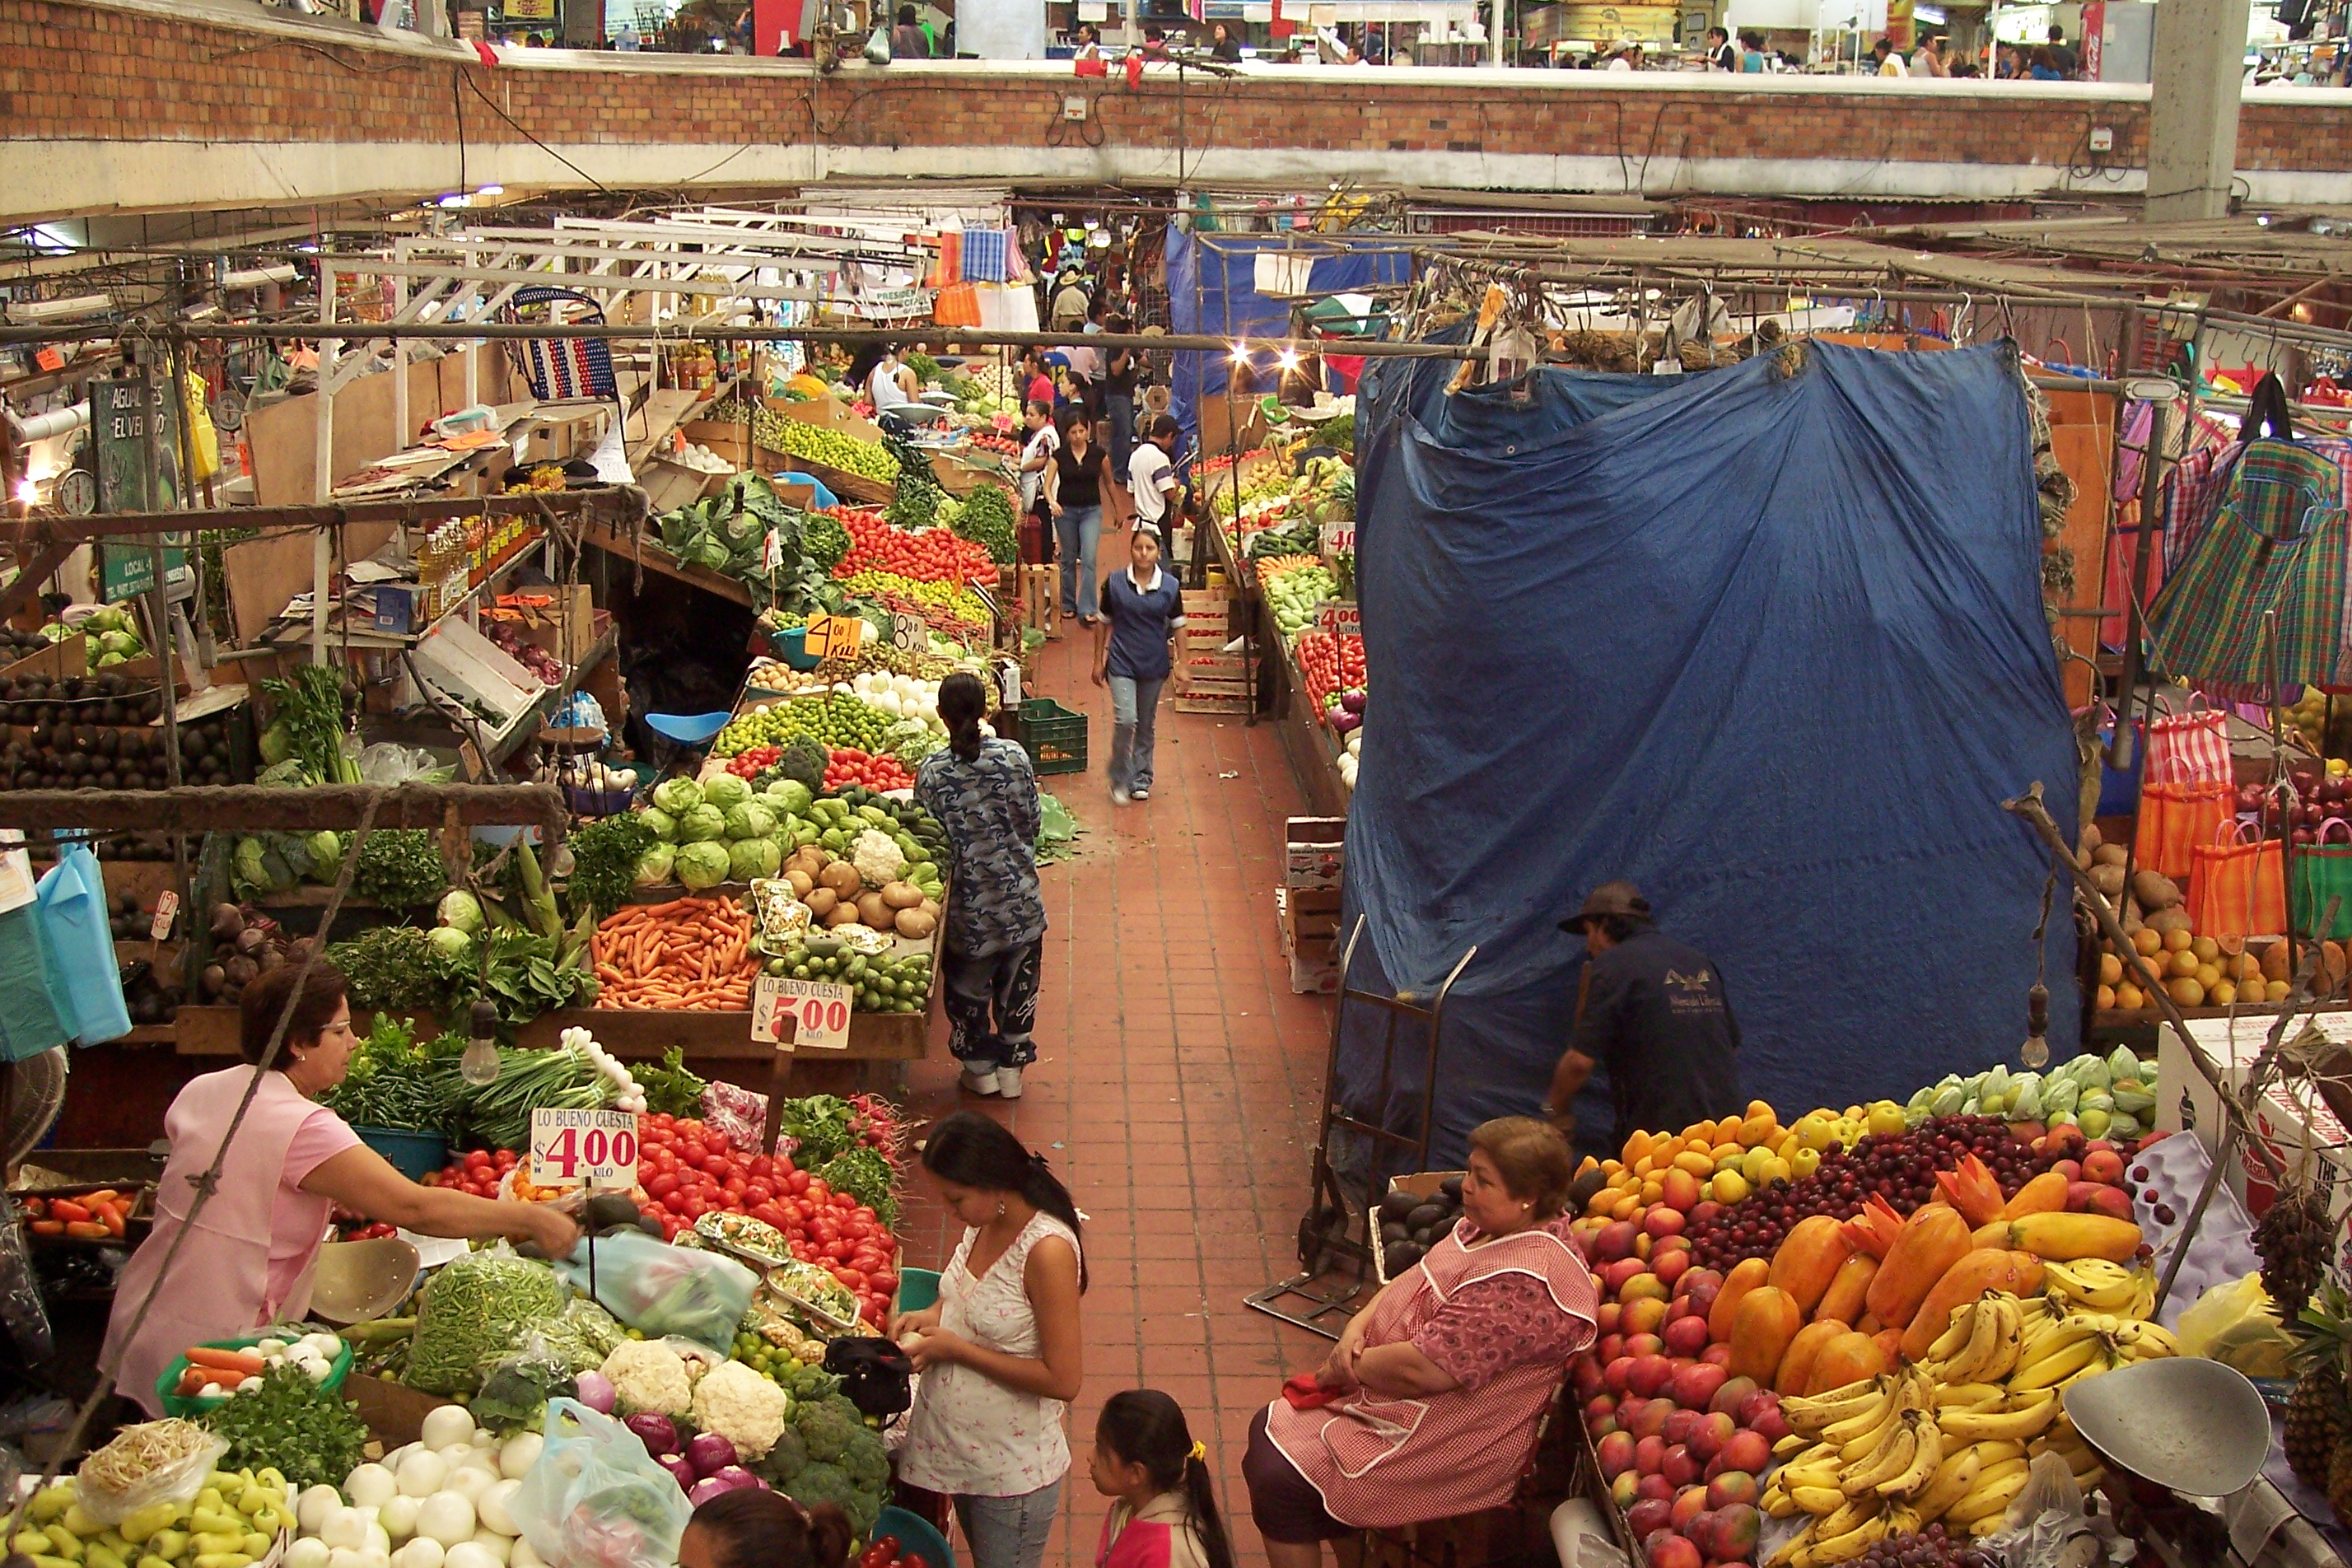 https://upload.wikimedia.org/wikipedia/commons/8/8c/MercadodeSanJuandeDios.jpg